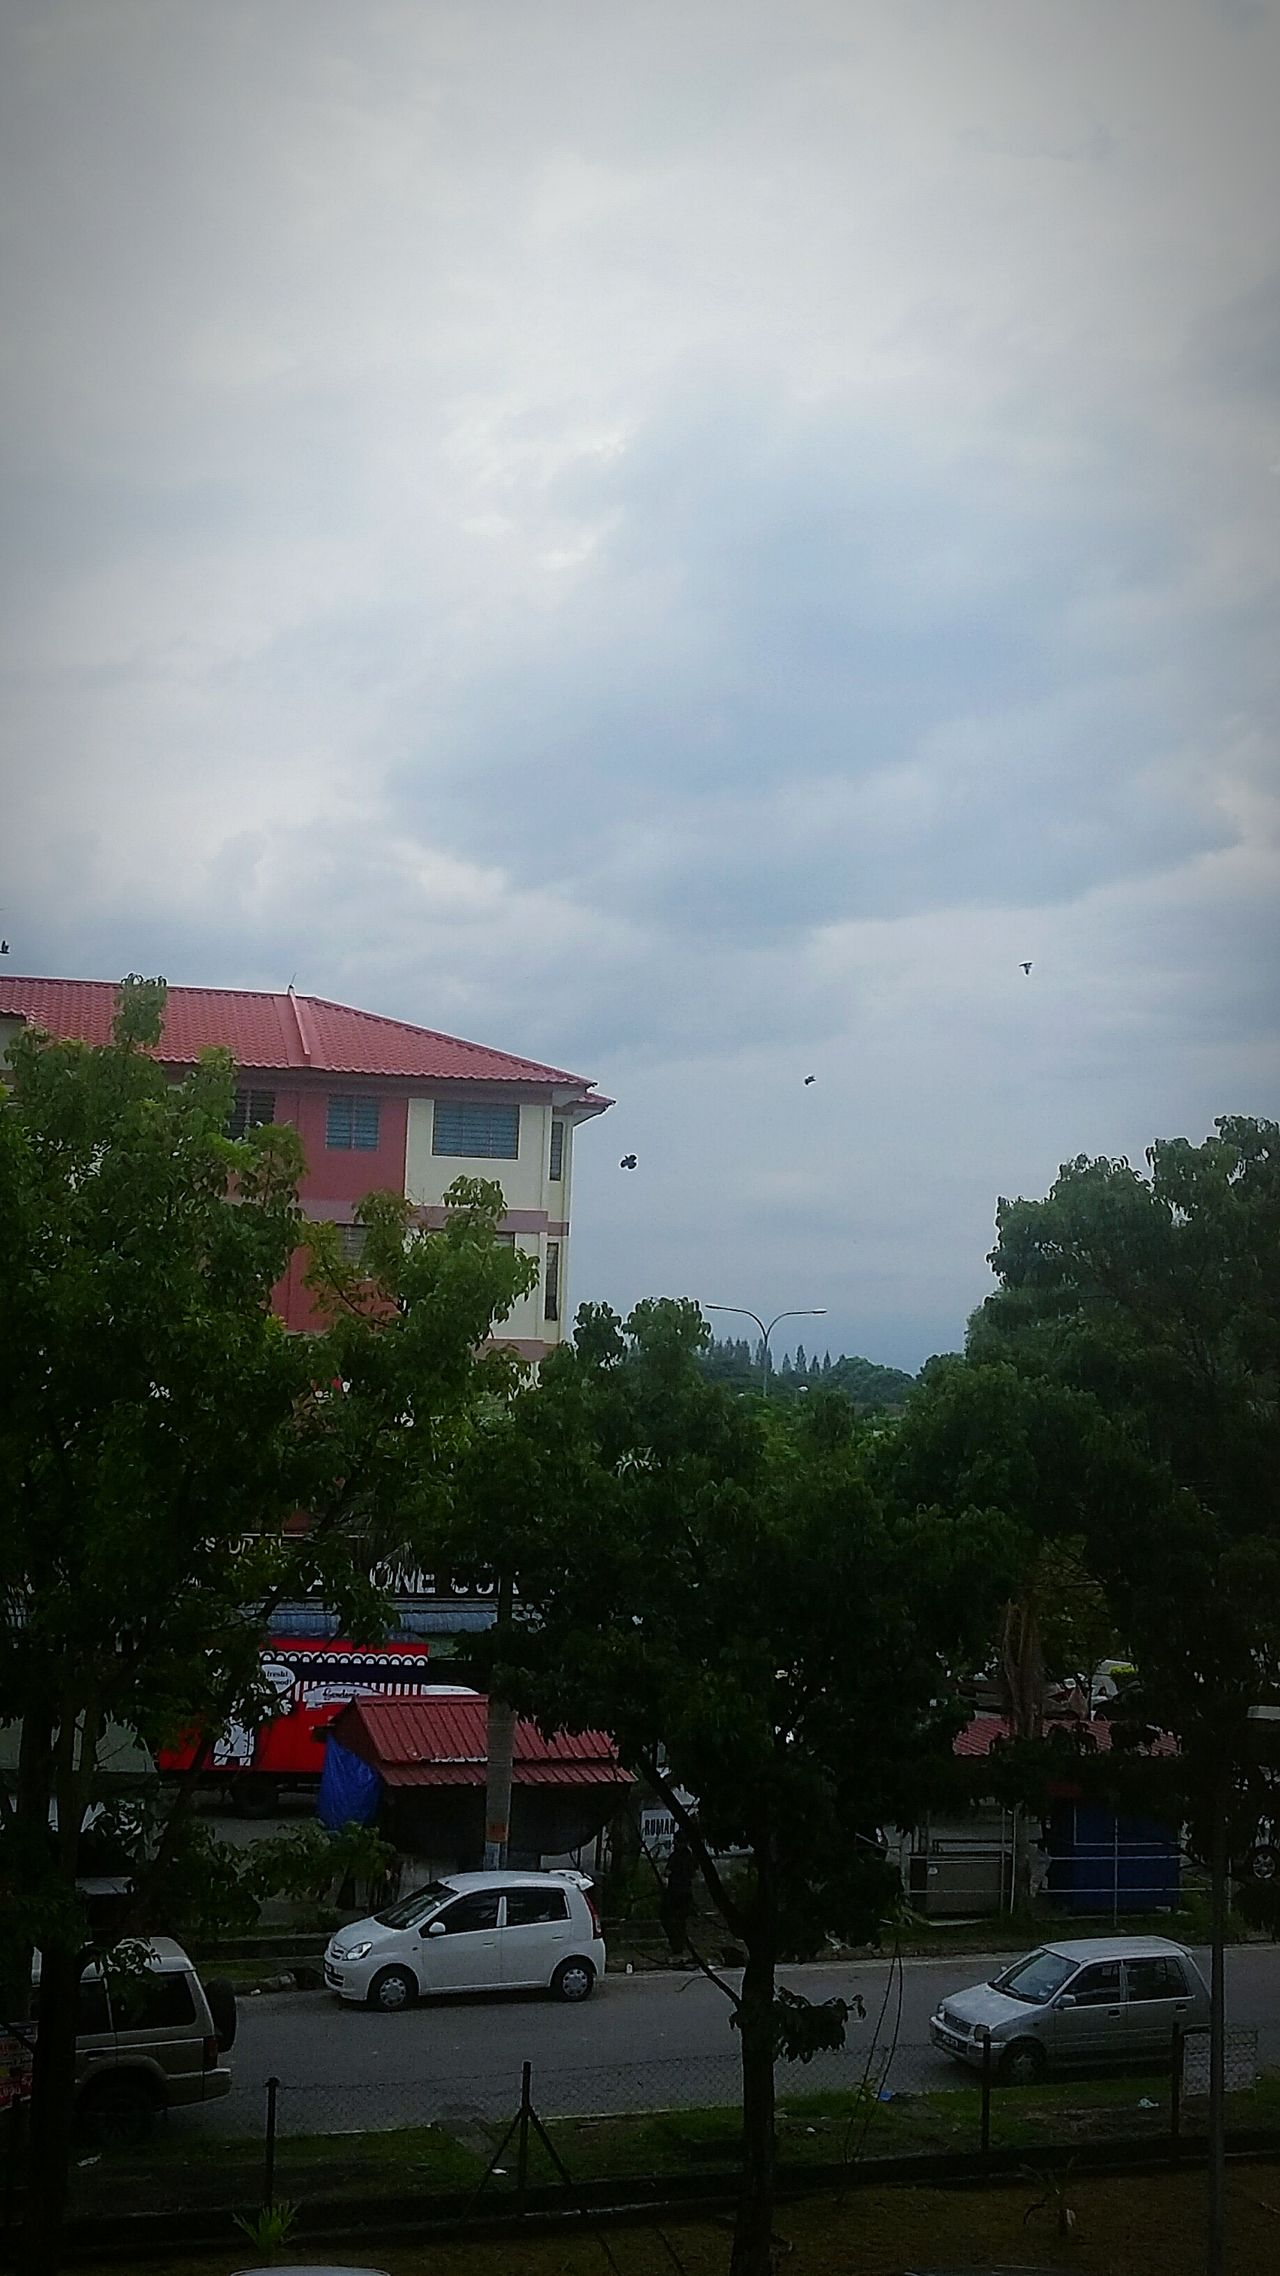 Enjoying Life Hello World Sky And Clouds Morning Light EyeEm Malaysia Penang Roomview